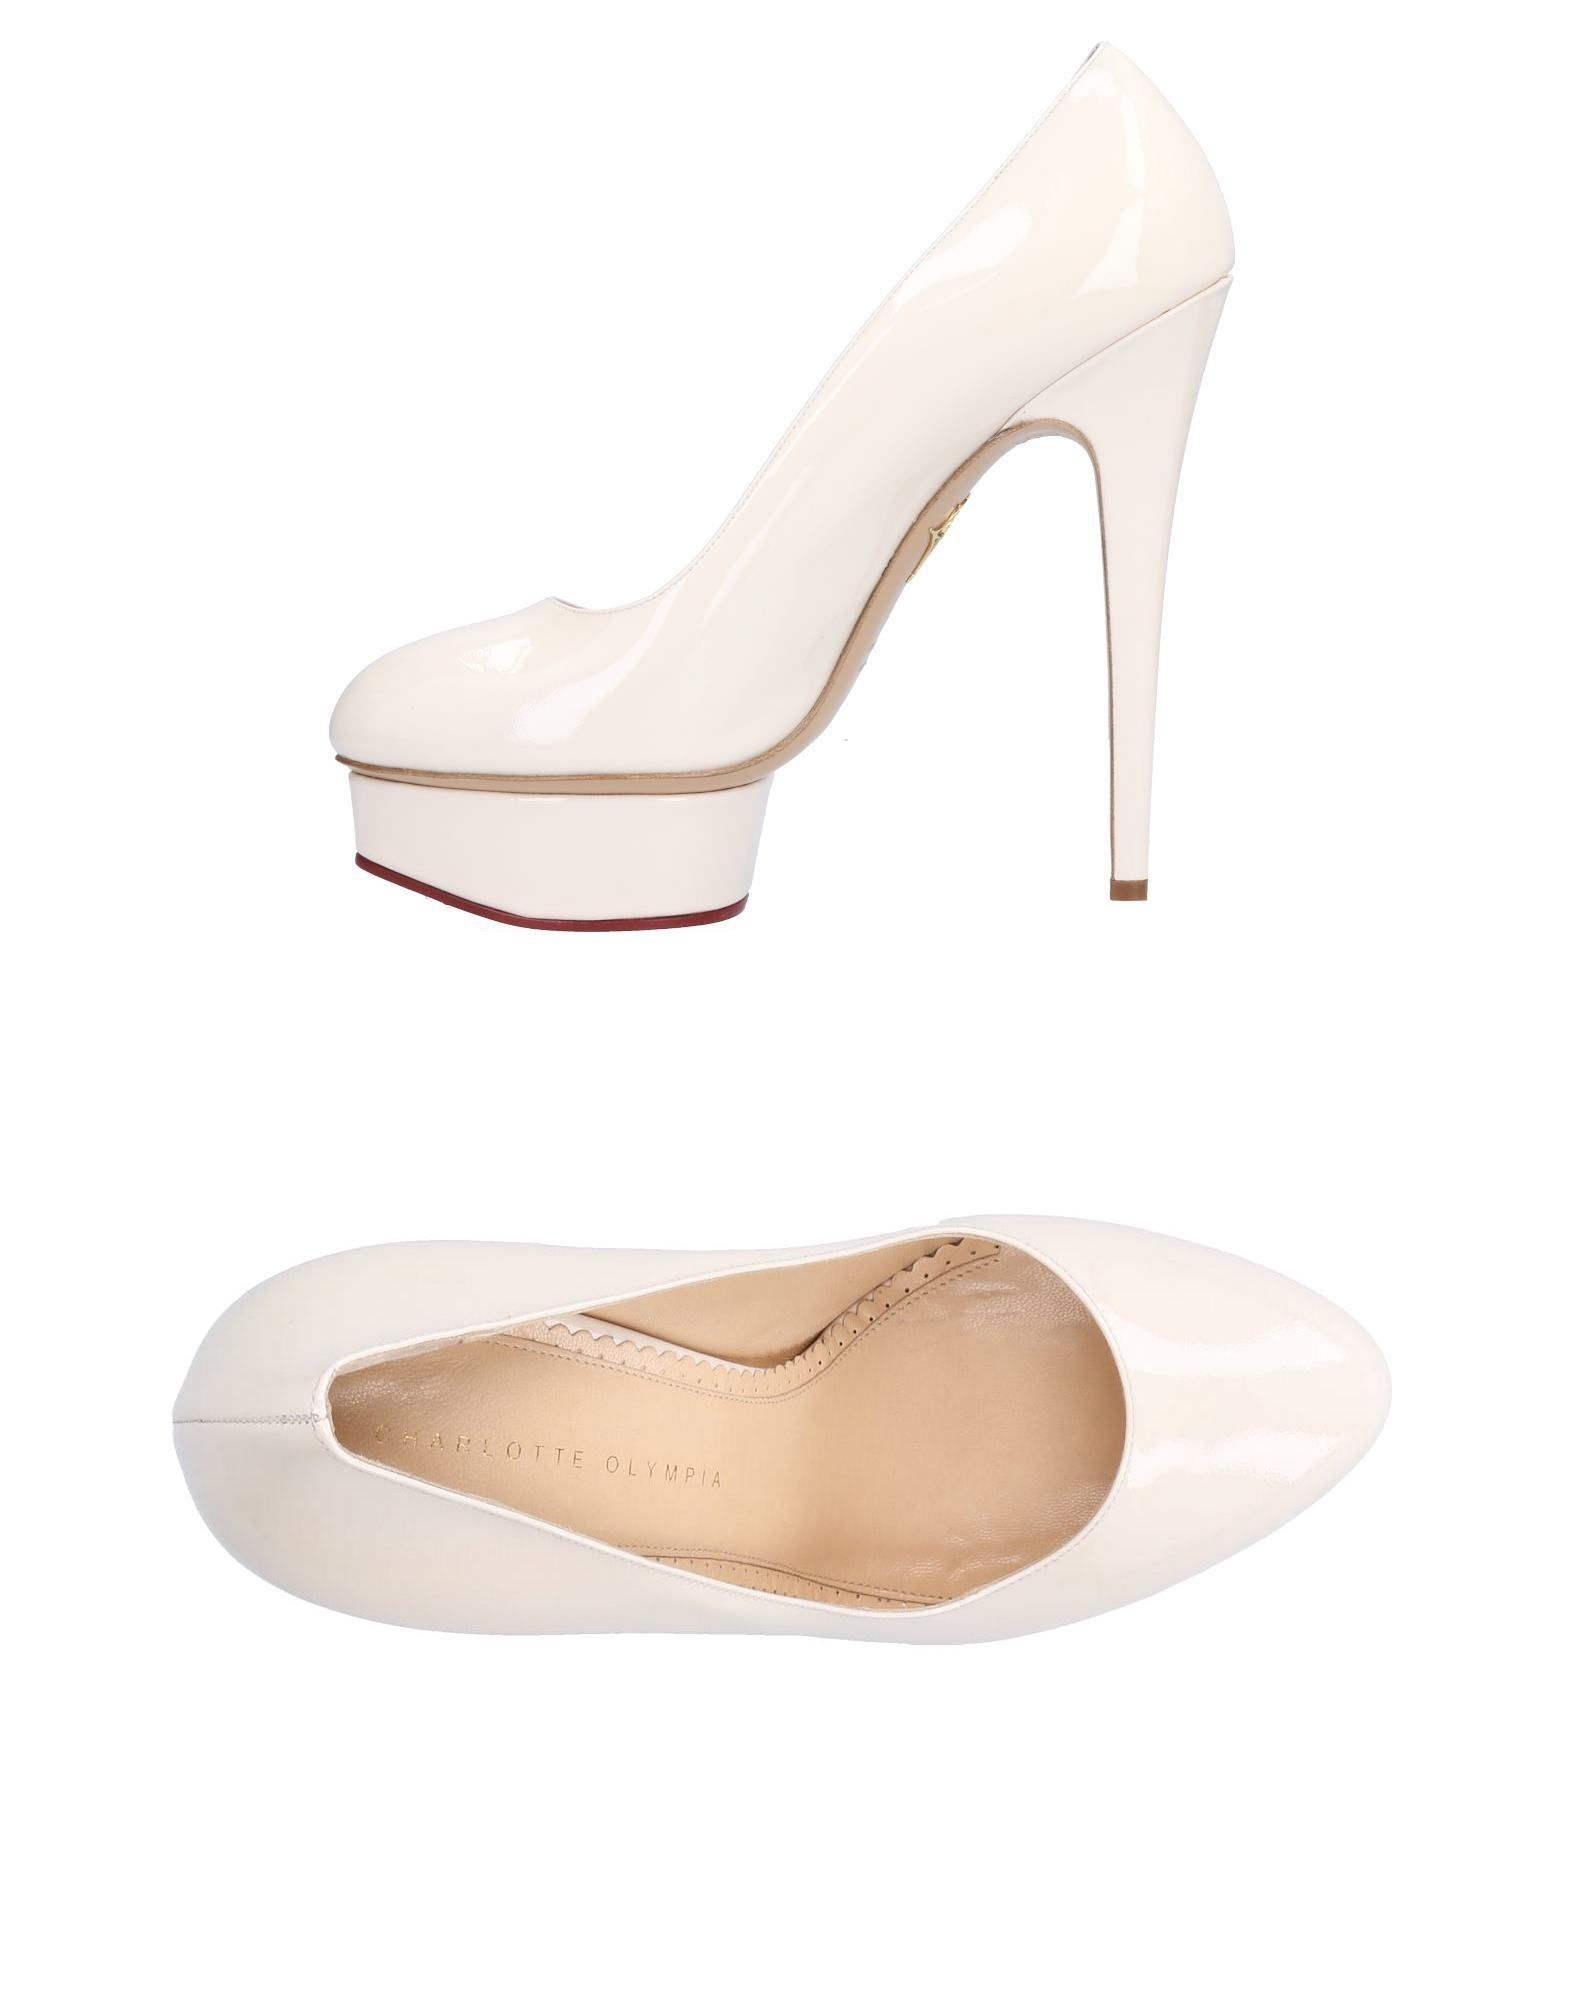 Rabatt Schuhe Charlotte Olympia Pumps Damen  11499994FK